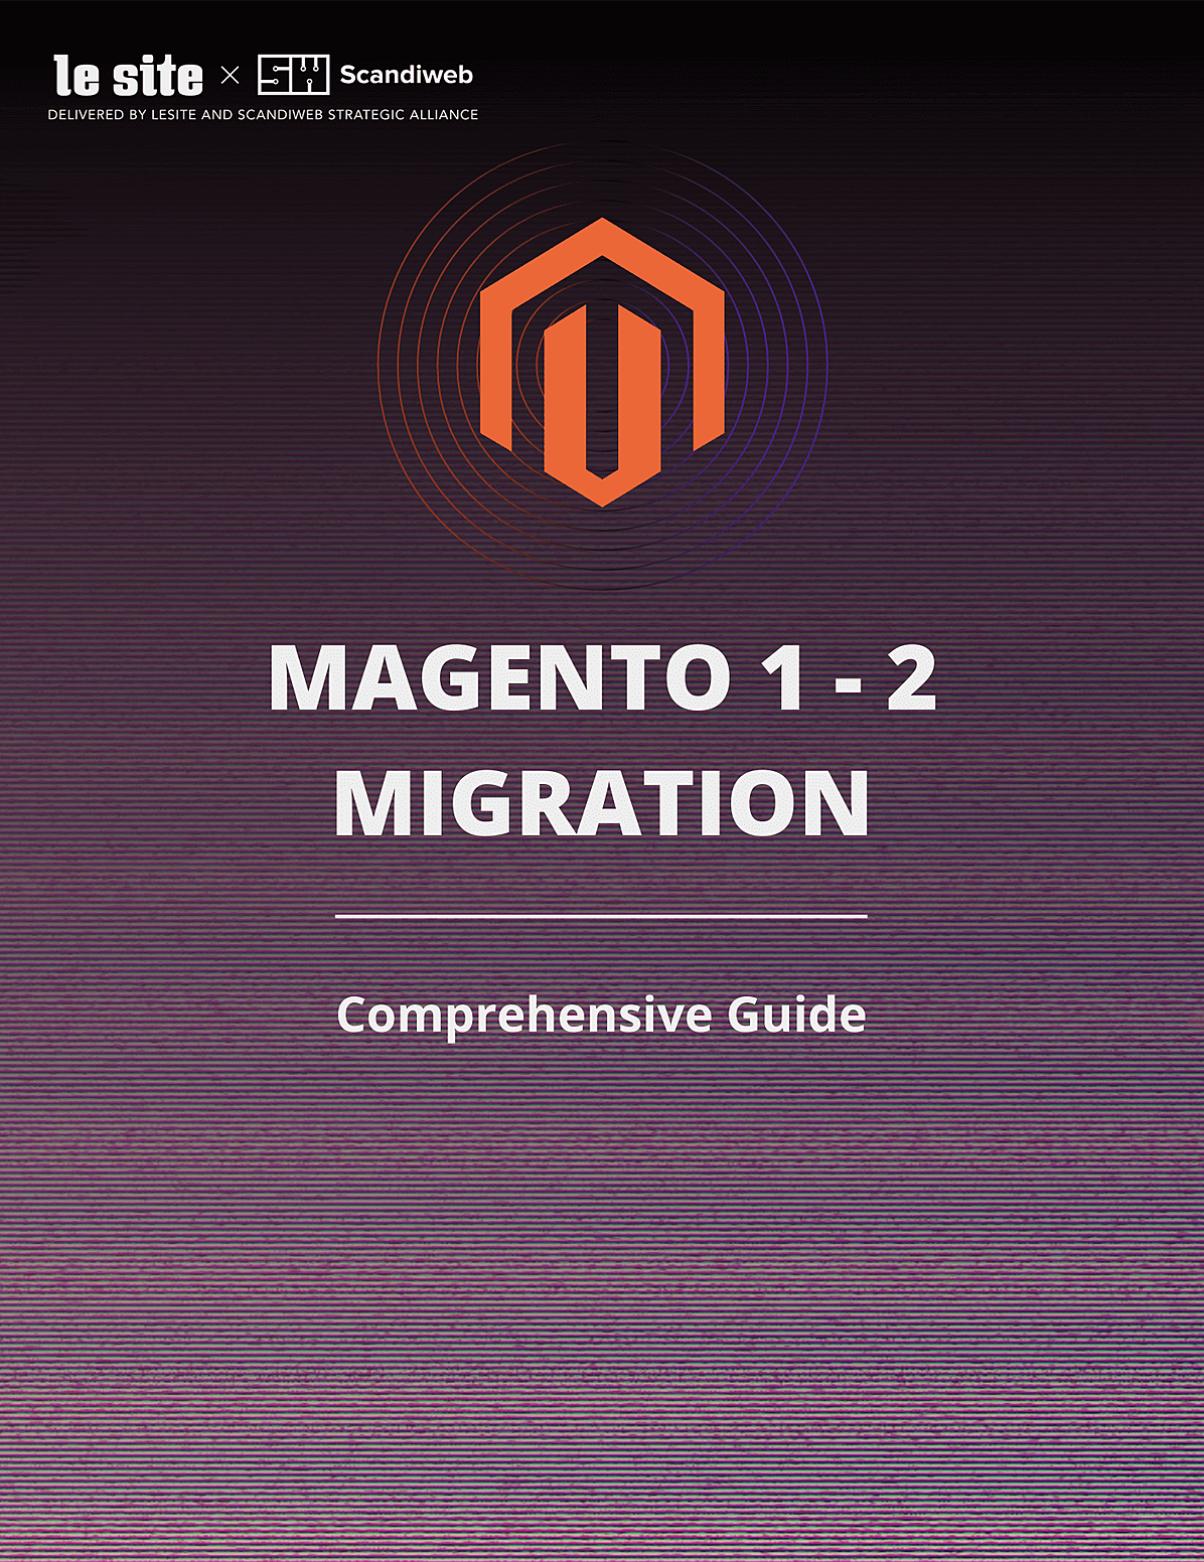 Magento 1 to 2 migration guide cover